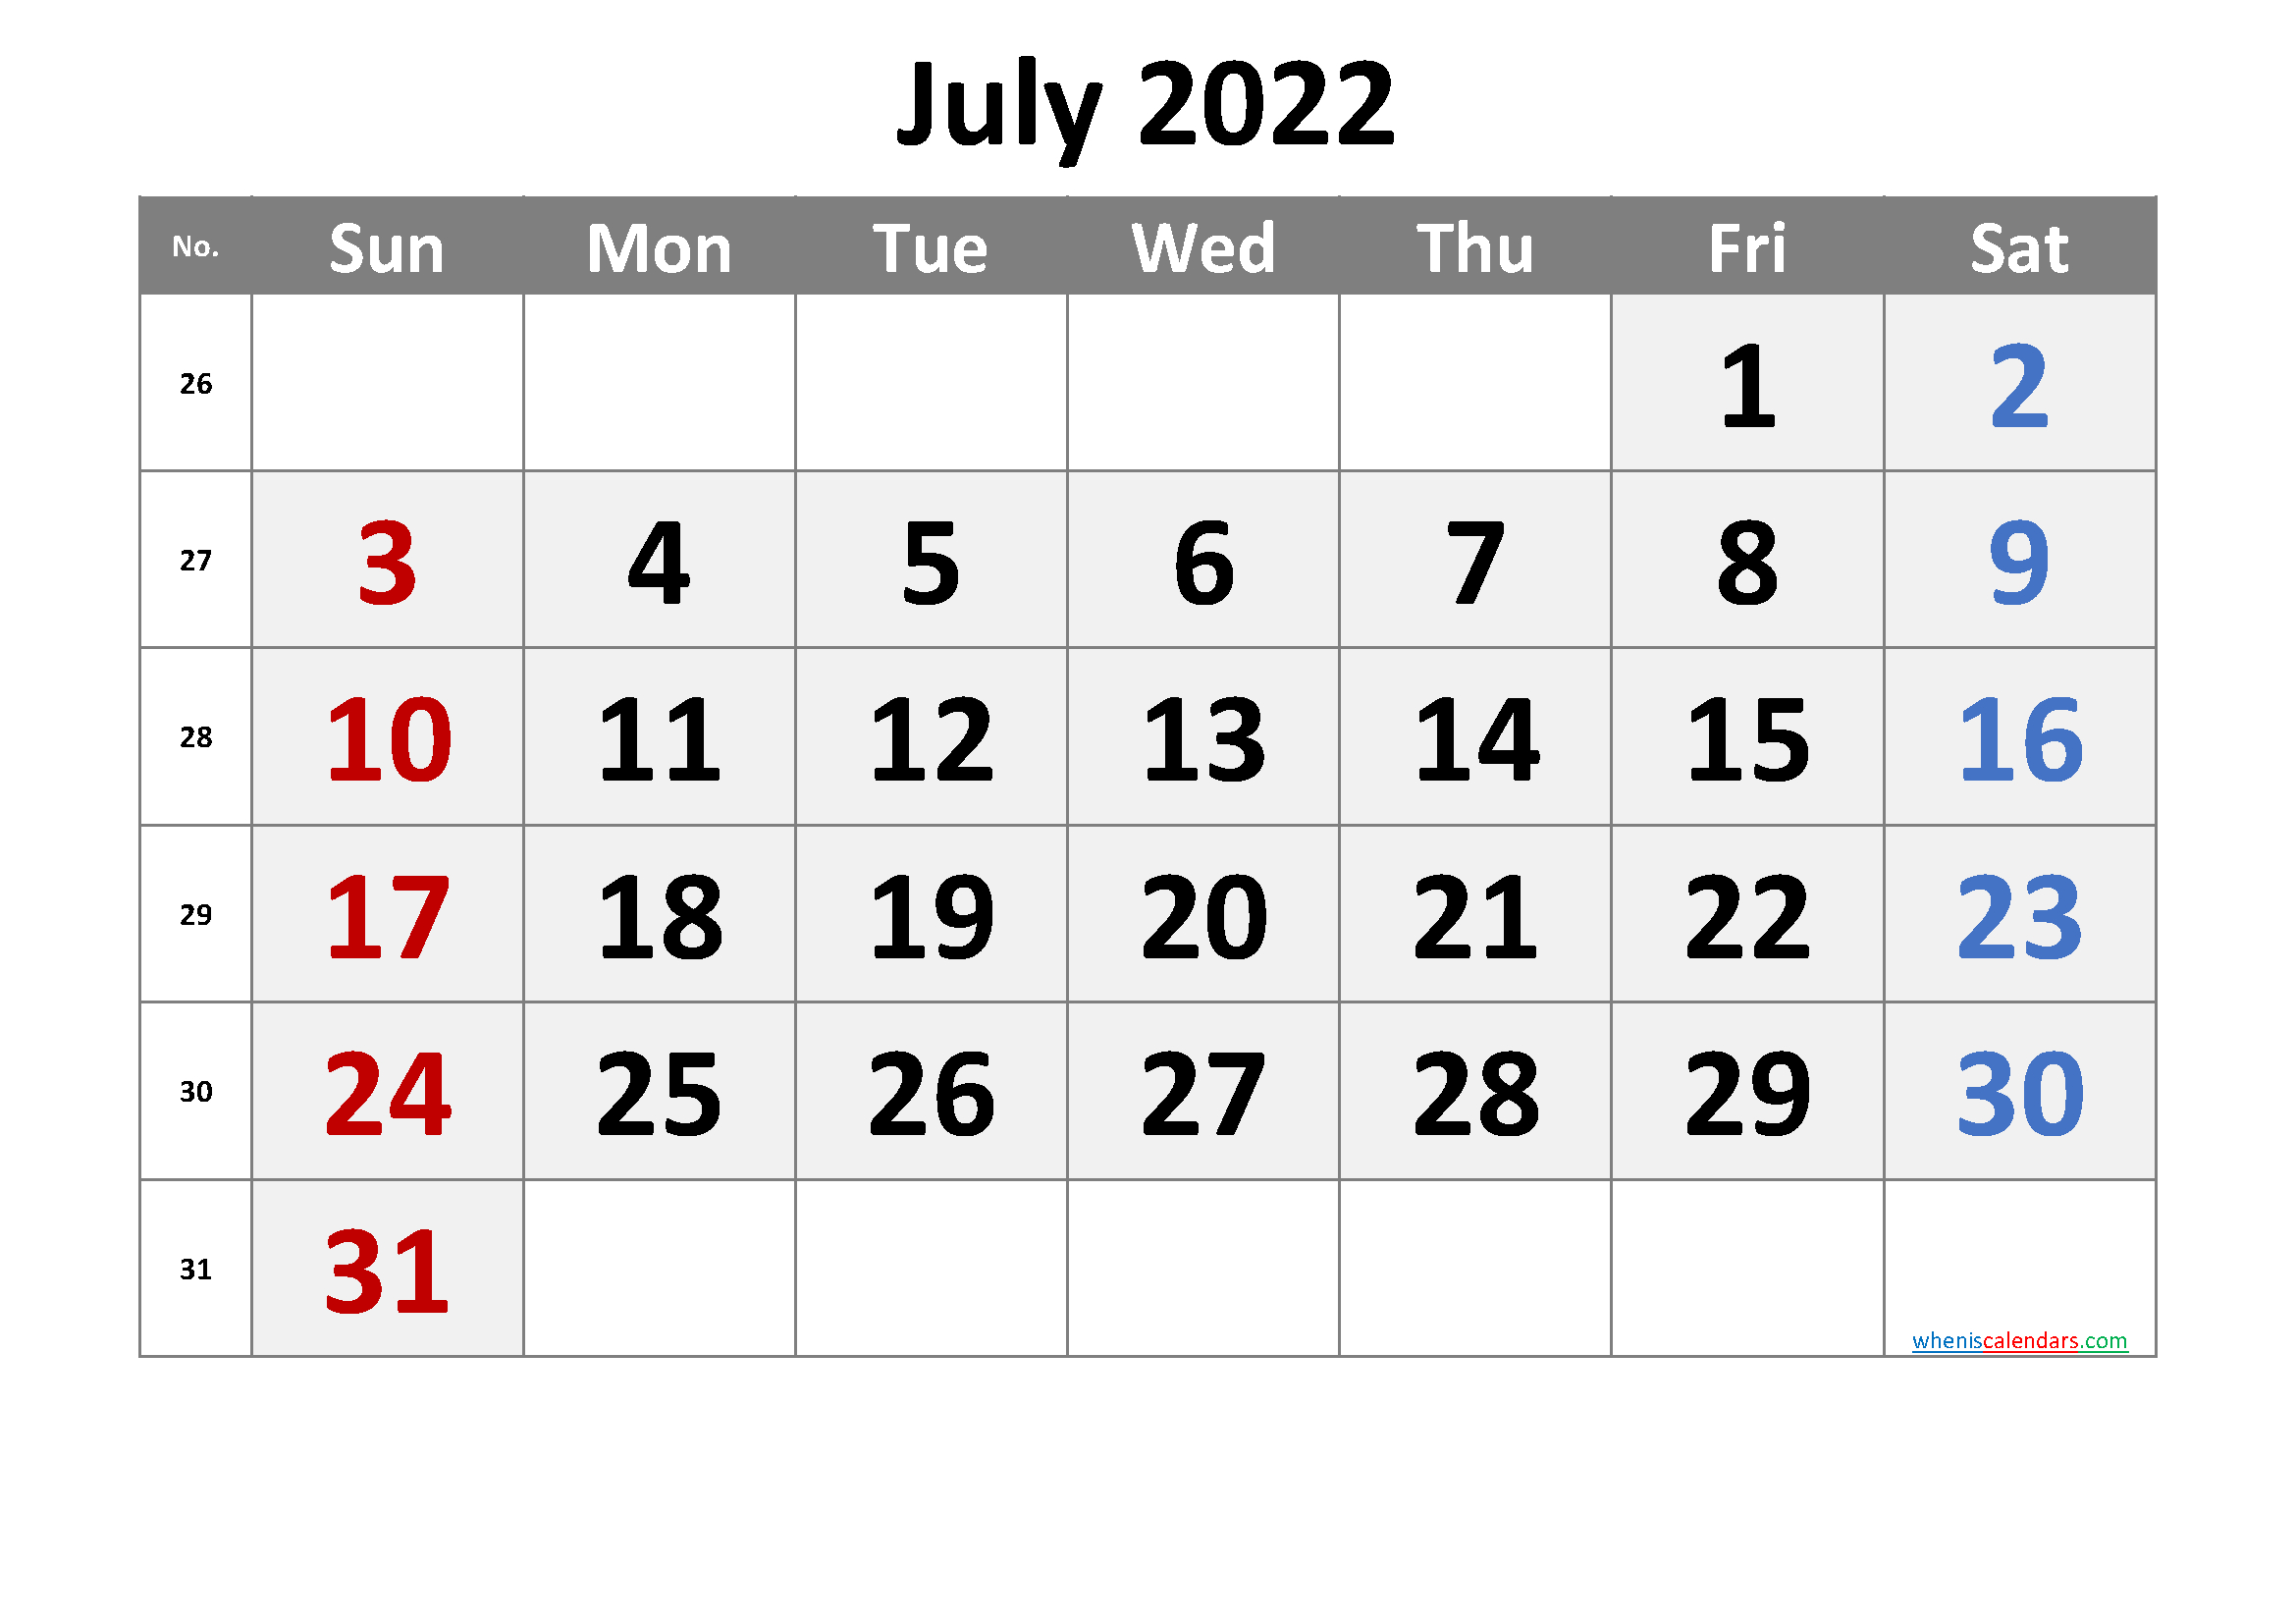 Printable Calendar July 2022 - 6 Templates In 2020 inside Printable 2022 July Calendar